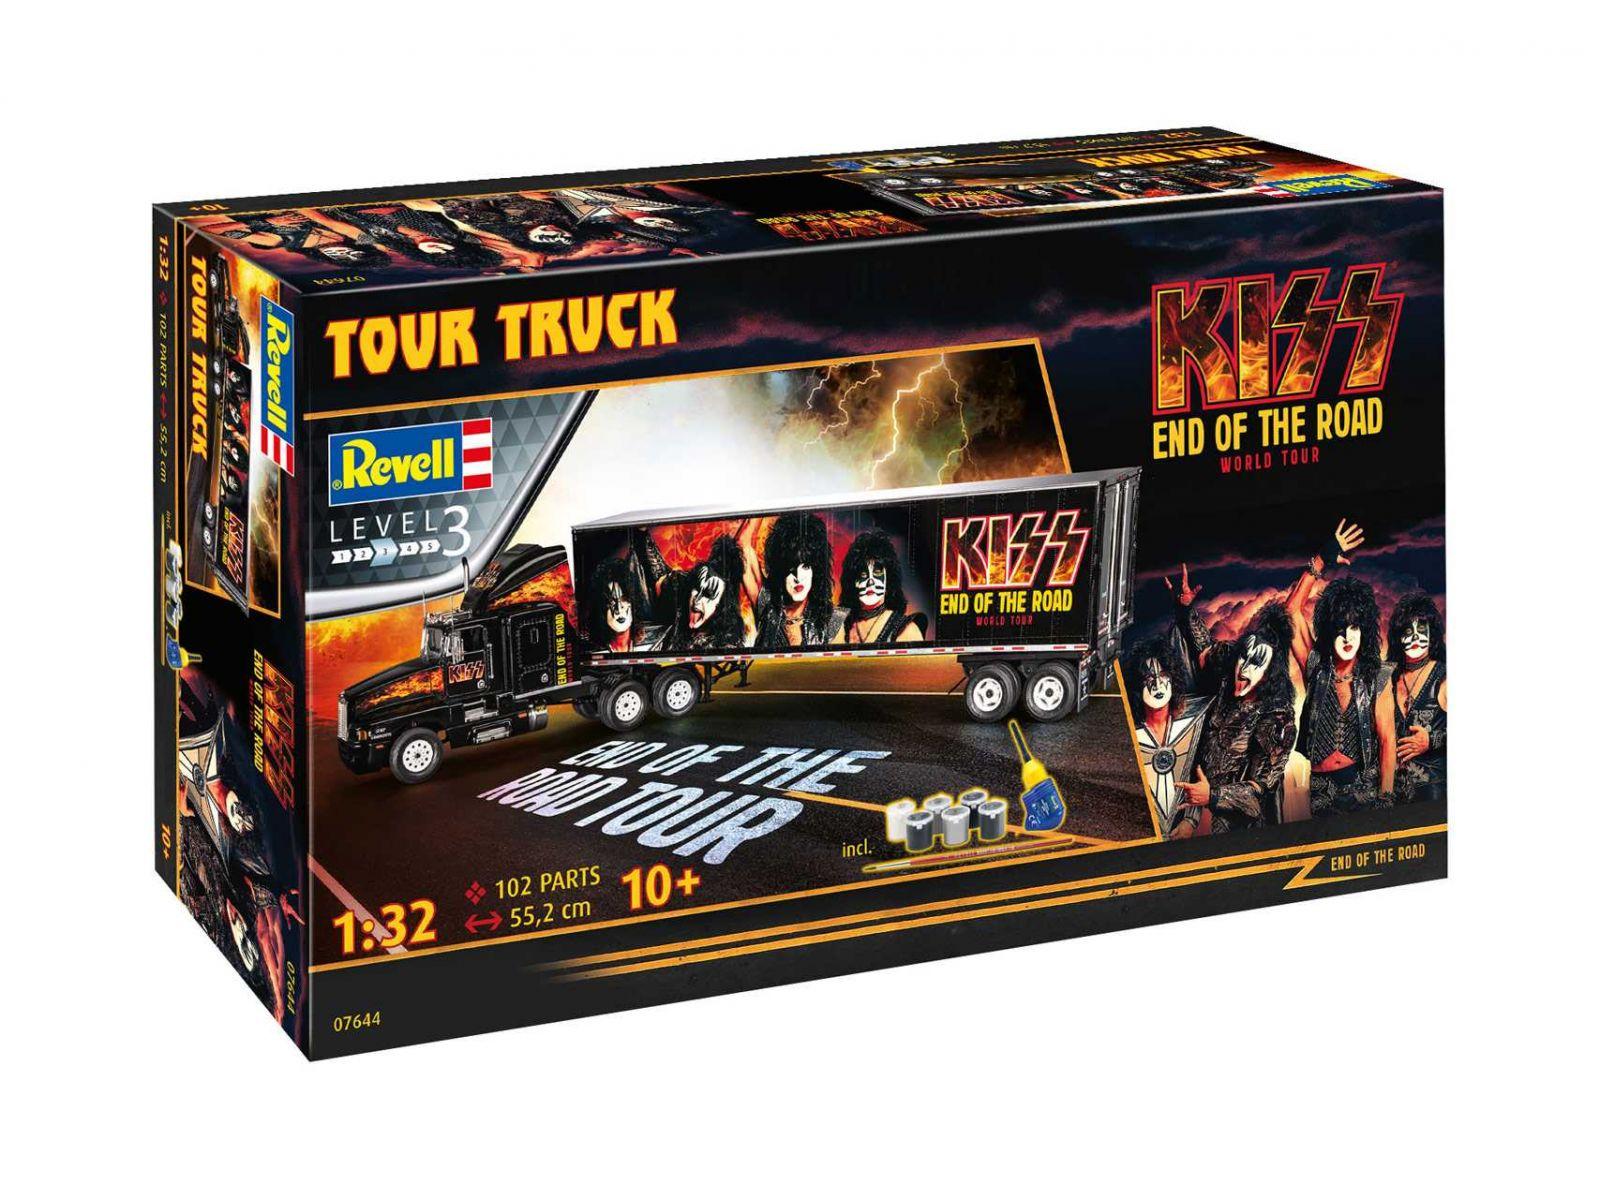 Gift-Set truck 07644 - KISS Tour Truck (1:32) Plastikové modely